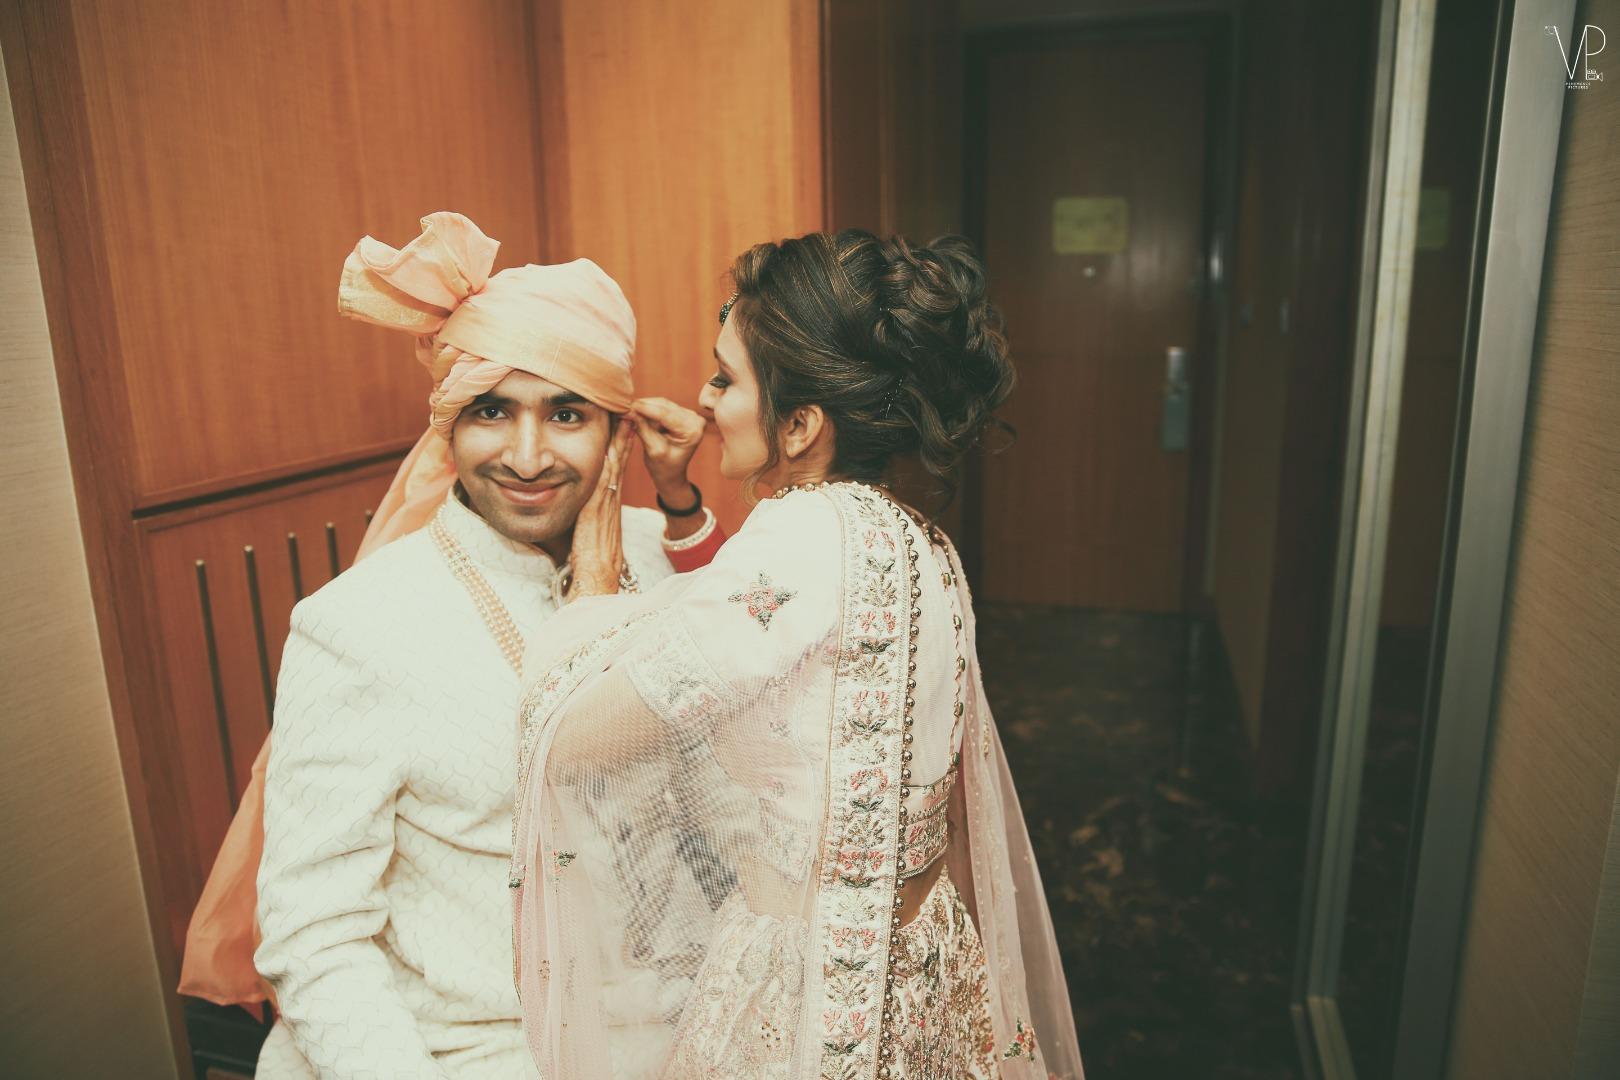 Indian Bride helping Groom Get Ready